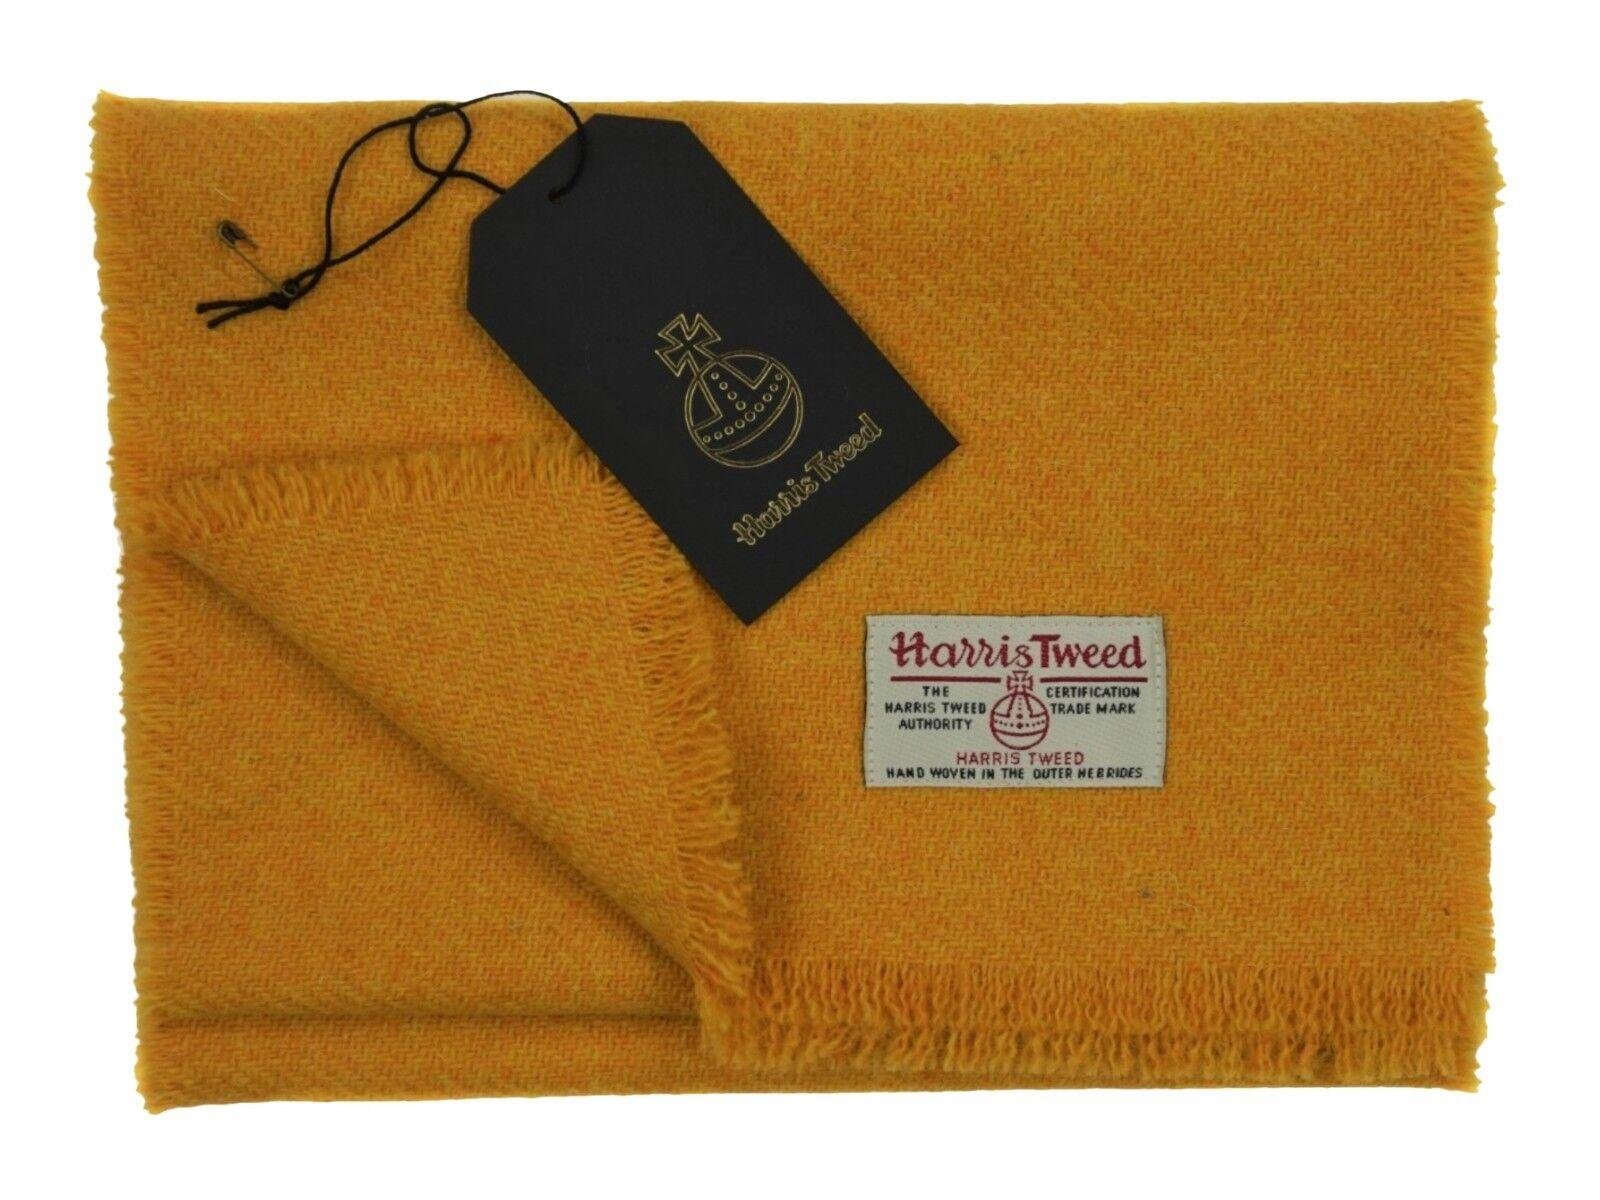 Harris Tweed Pure Wool Luxury Men, damen Fringed Scarf 60 60 60  150cm Length Mustard  | Zart  acb784